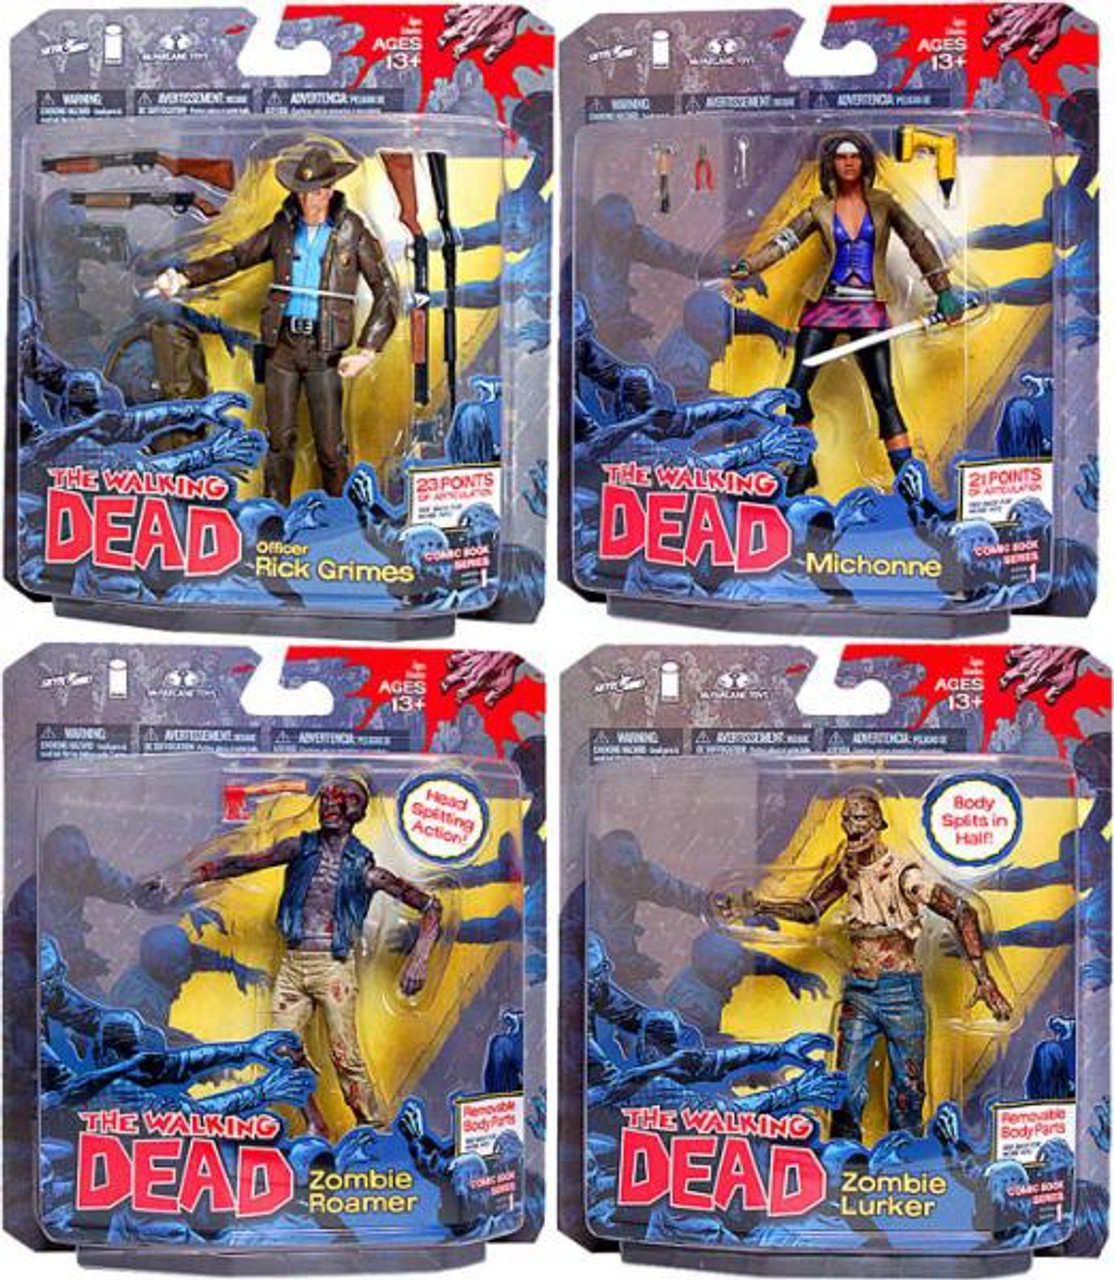 McFarlane Toys Walking Dead Comic Book Series 1 Set of 4 Action Figures